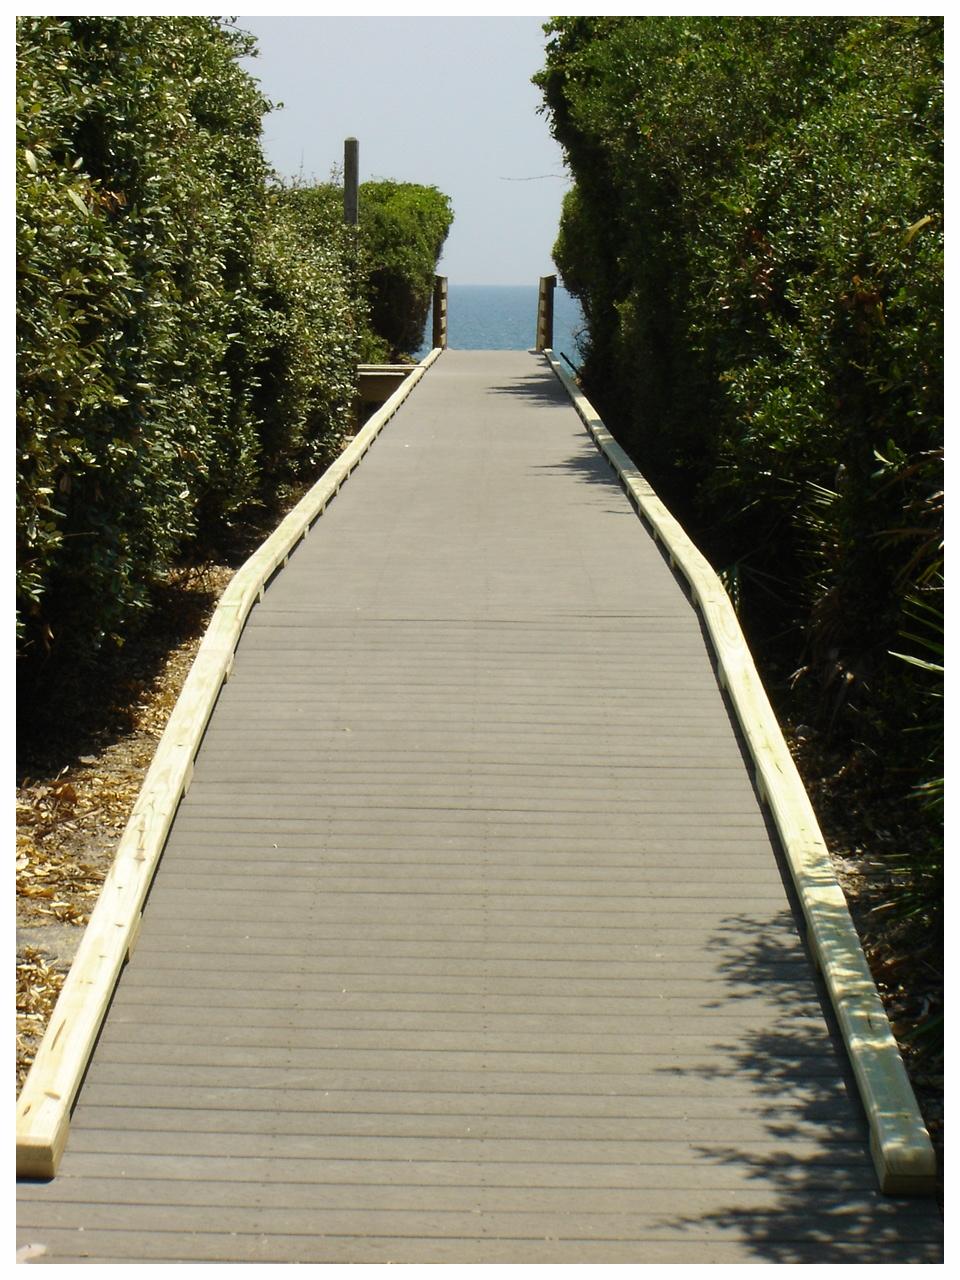 Beach Access Construction